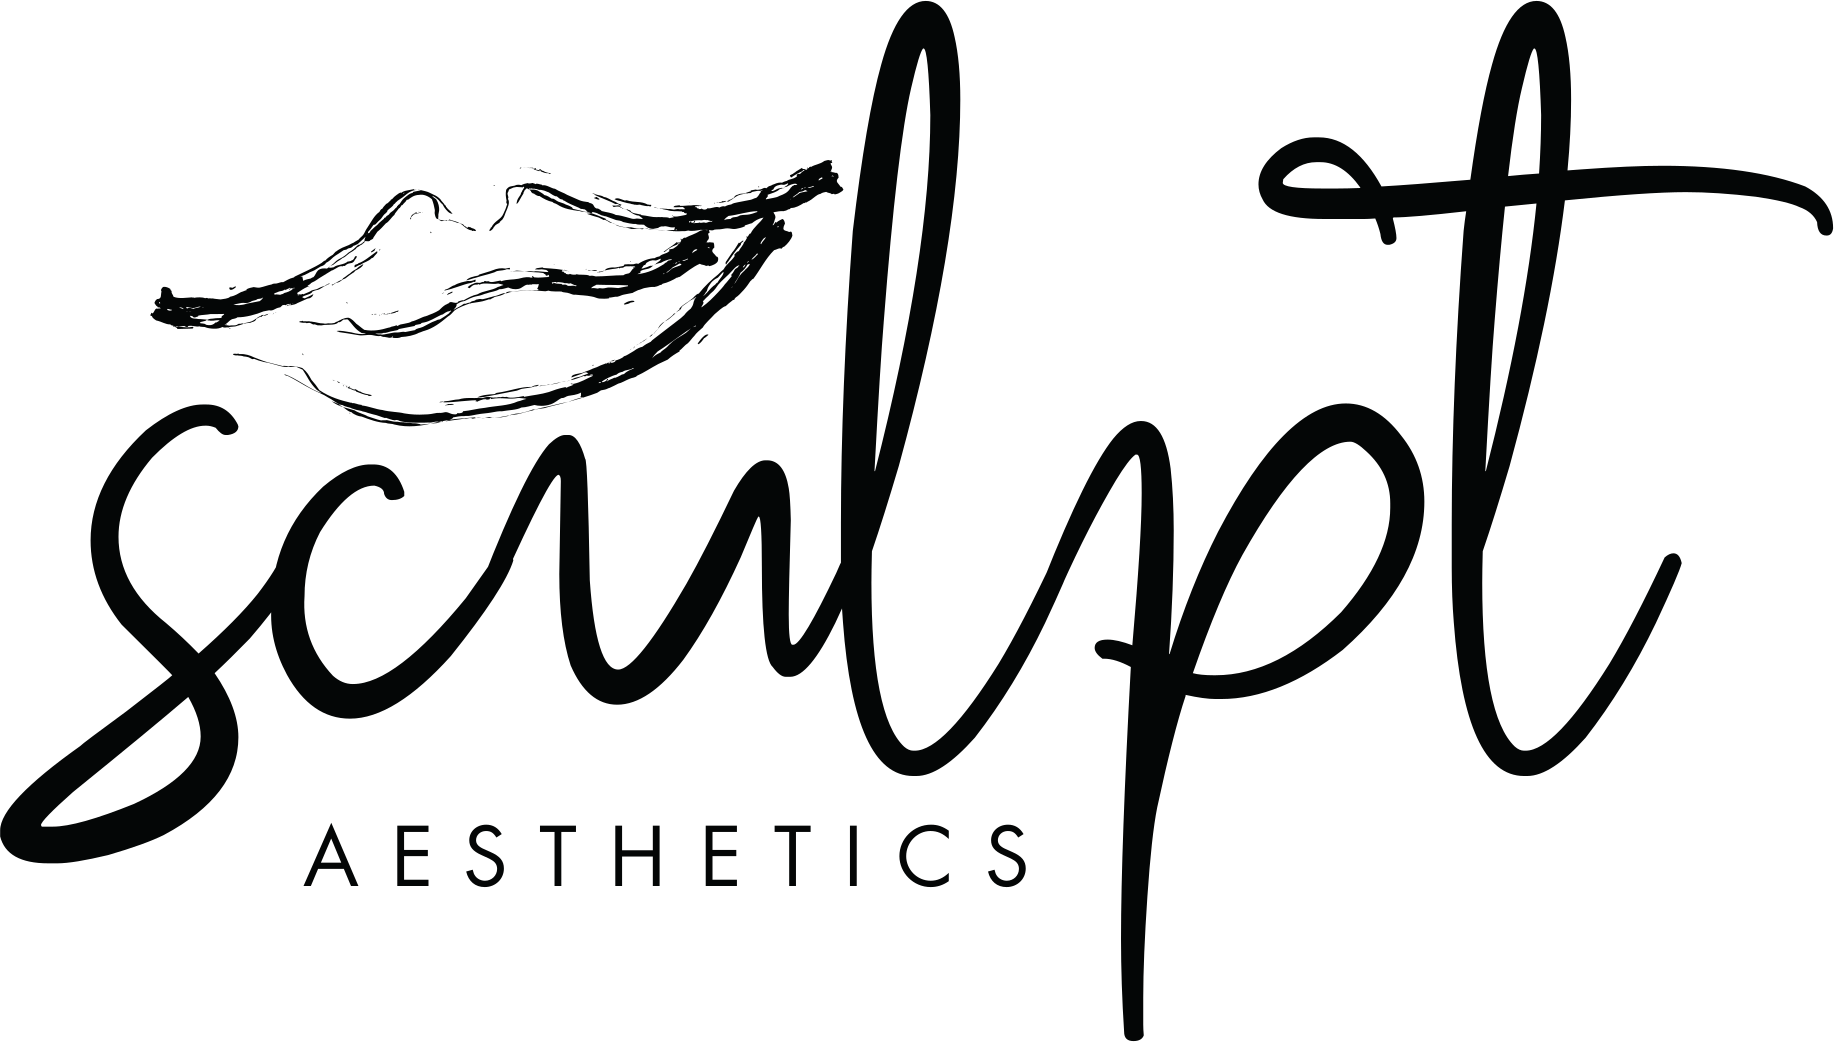 Sculpt Aesthetics Clinic